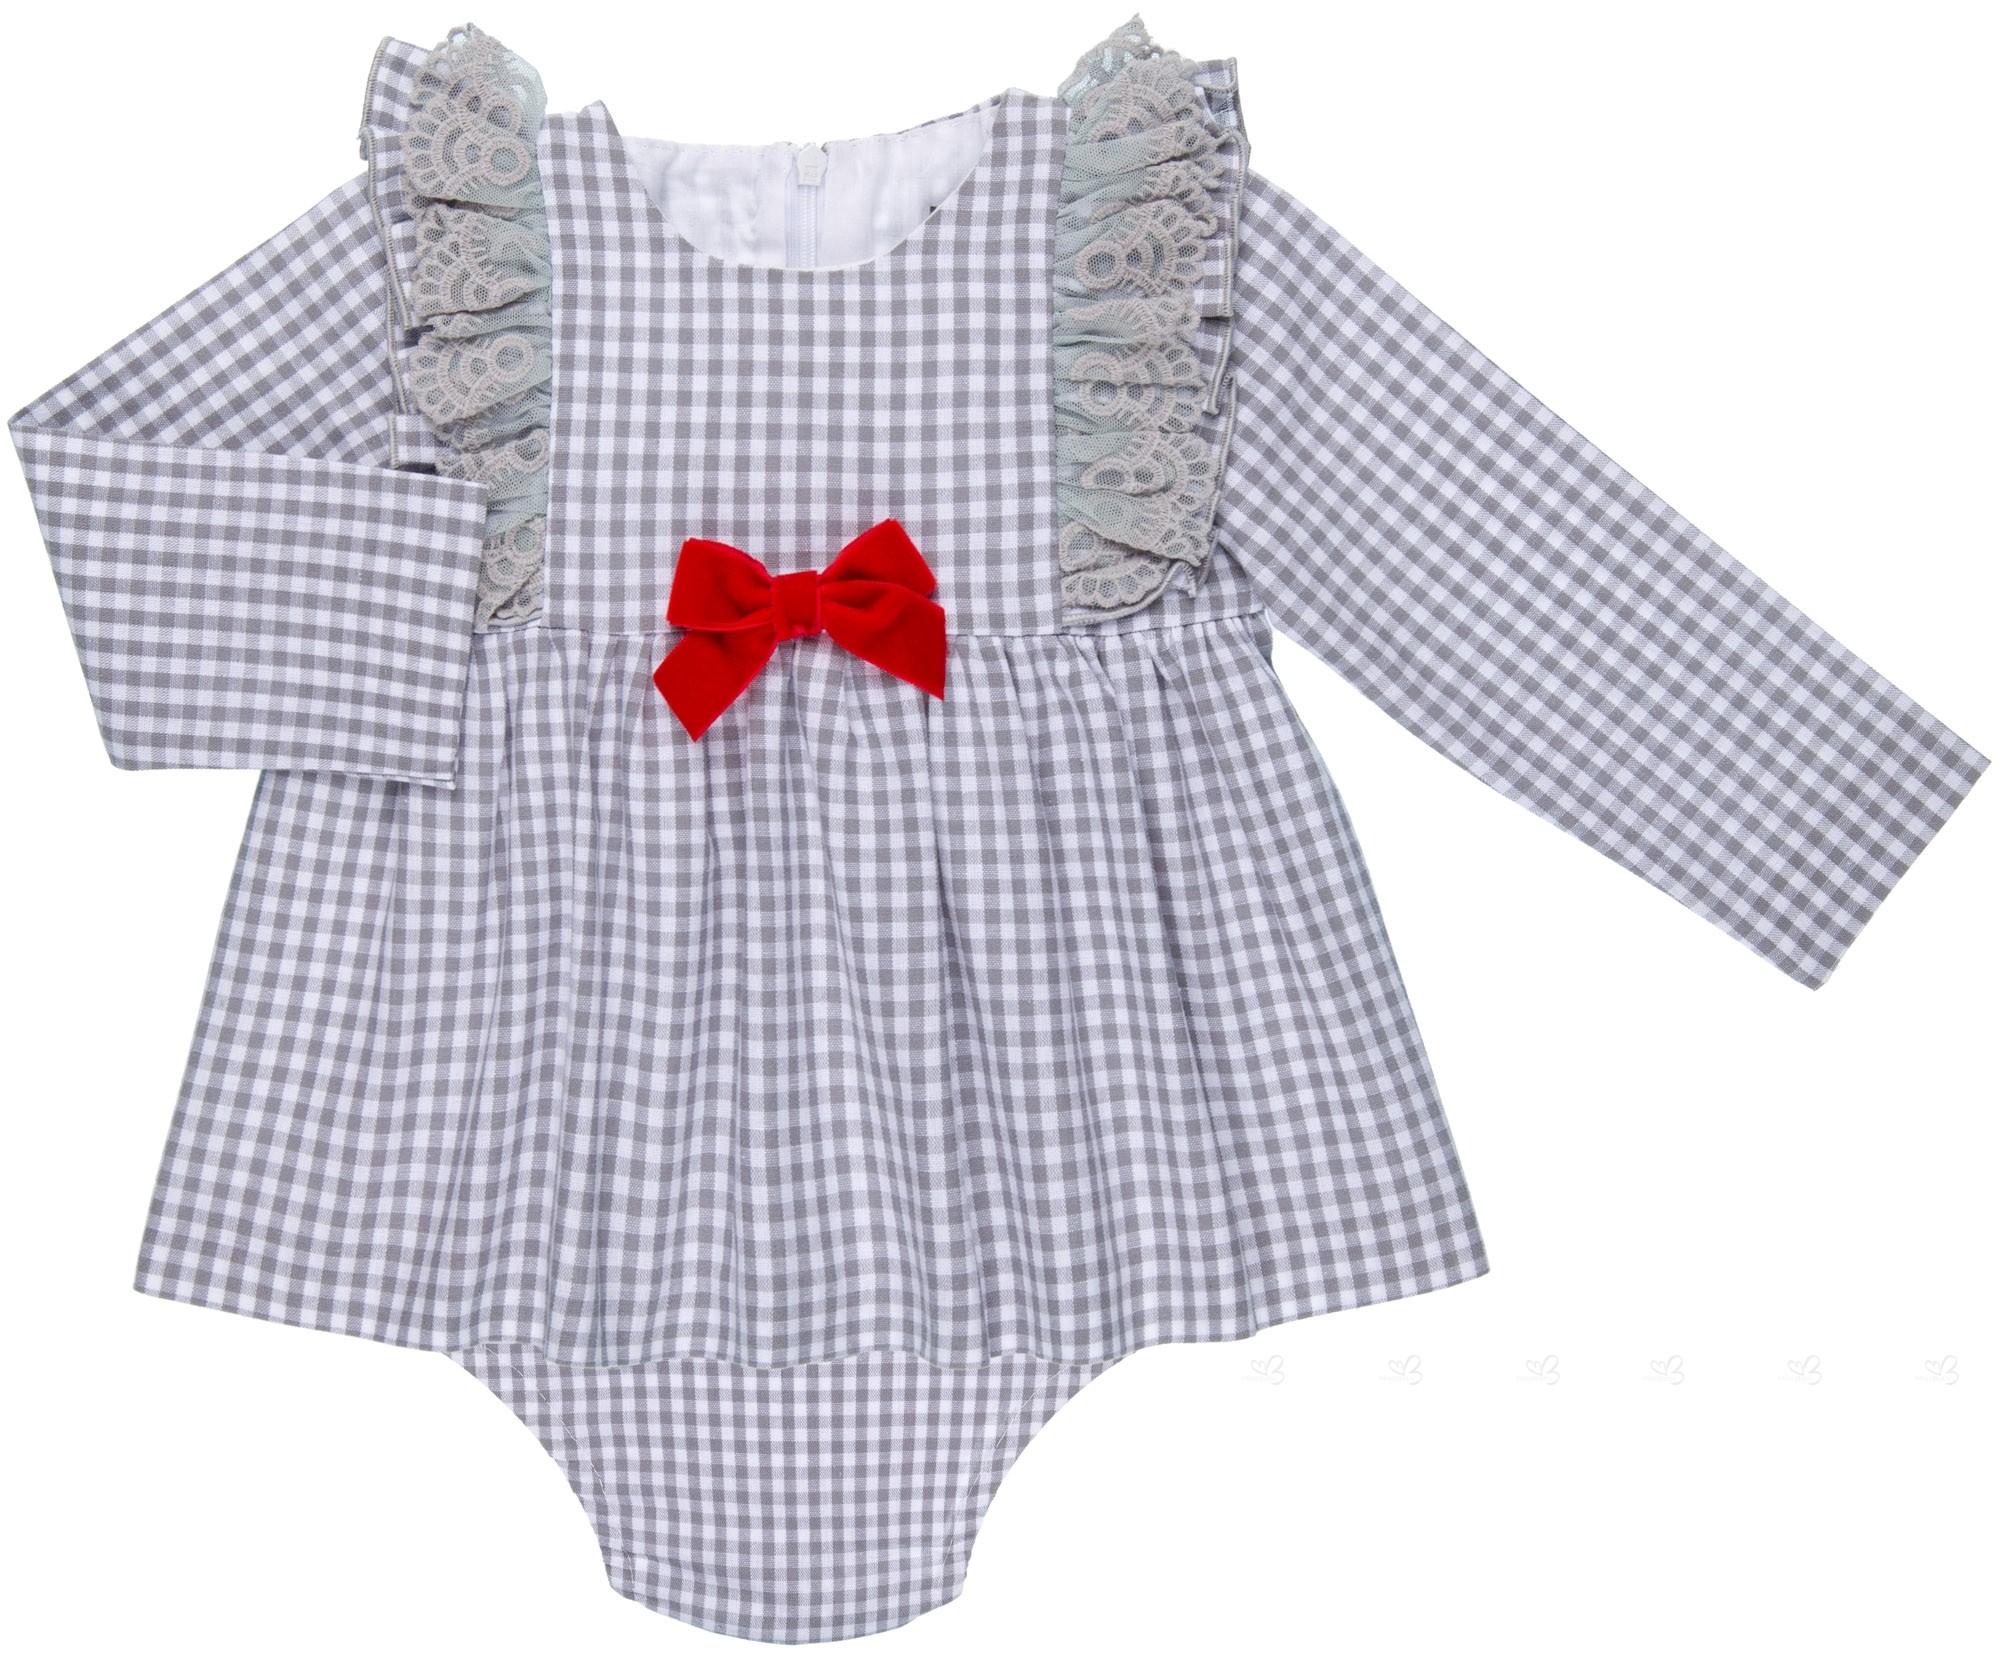 4f5779f9b Mon Petit Bonbon Conjunto Bebé Niña Vestido   Braguita Cuadros Vichy Gris  ...